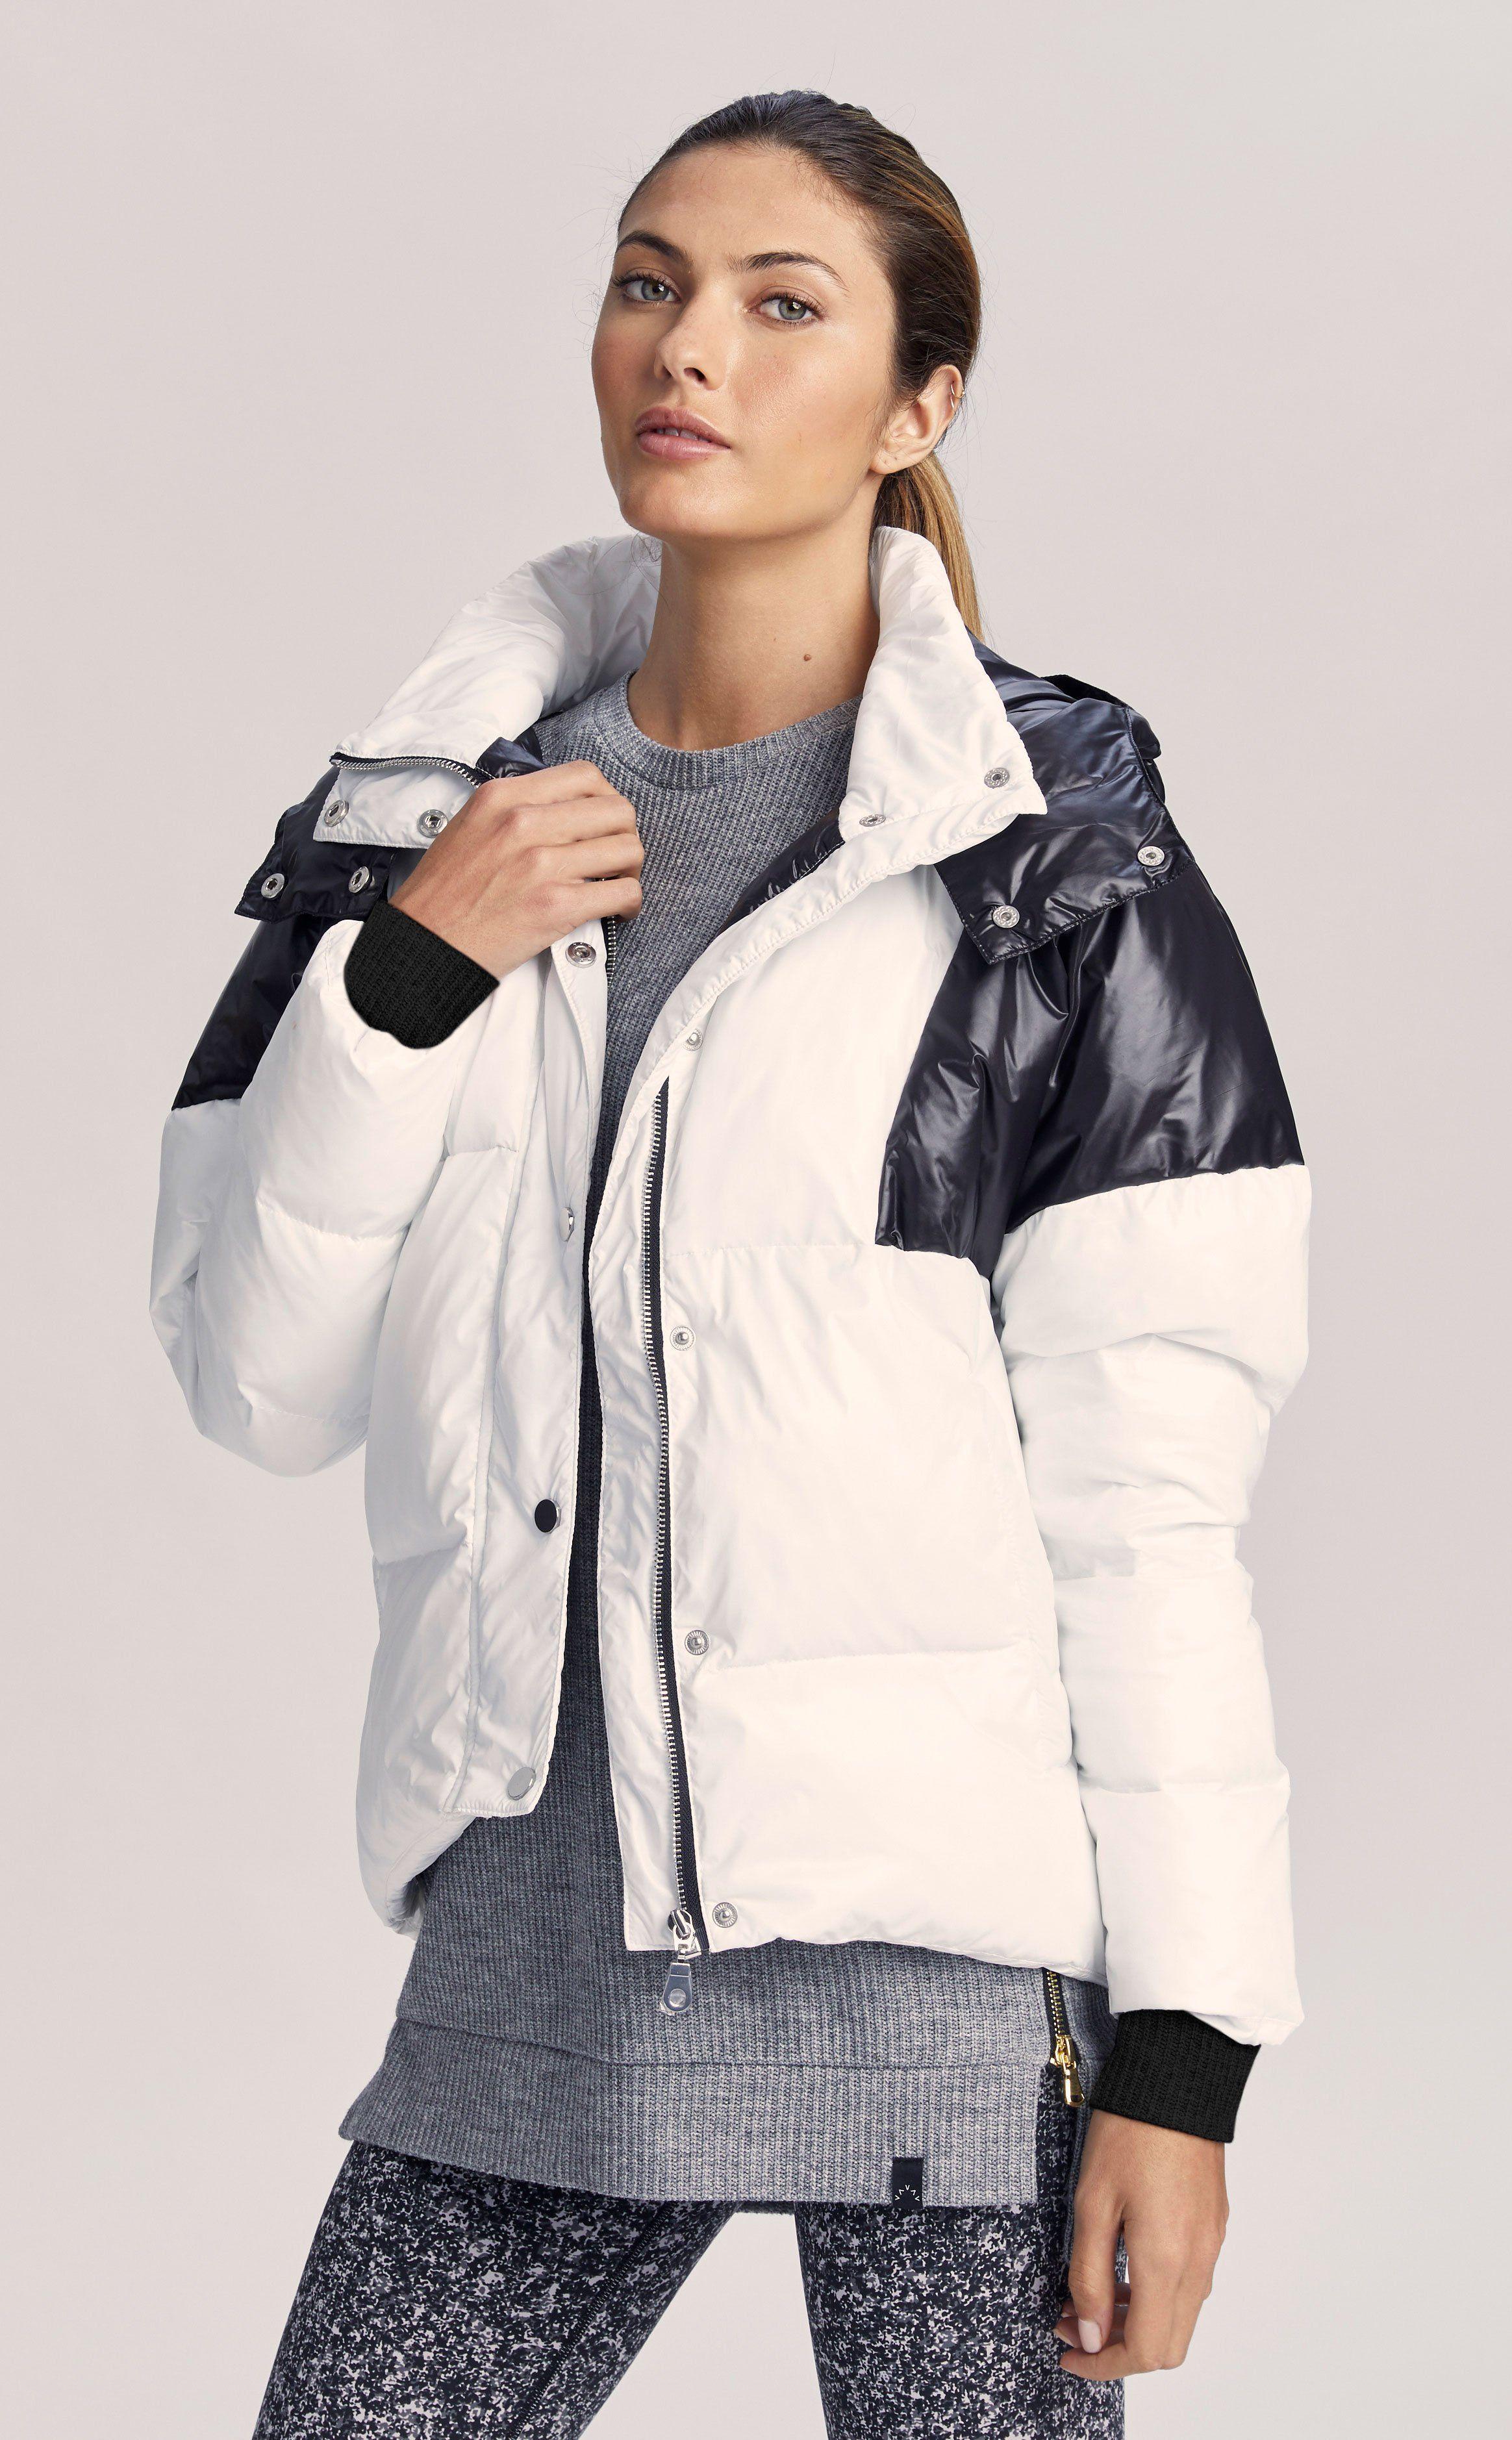 Highland In Black And White Oversized Puffer Jacket With Removable Hood Varley Uk Jackets Latest Sweatshirts Black [ 3757 x 2328 Pixel ]